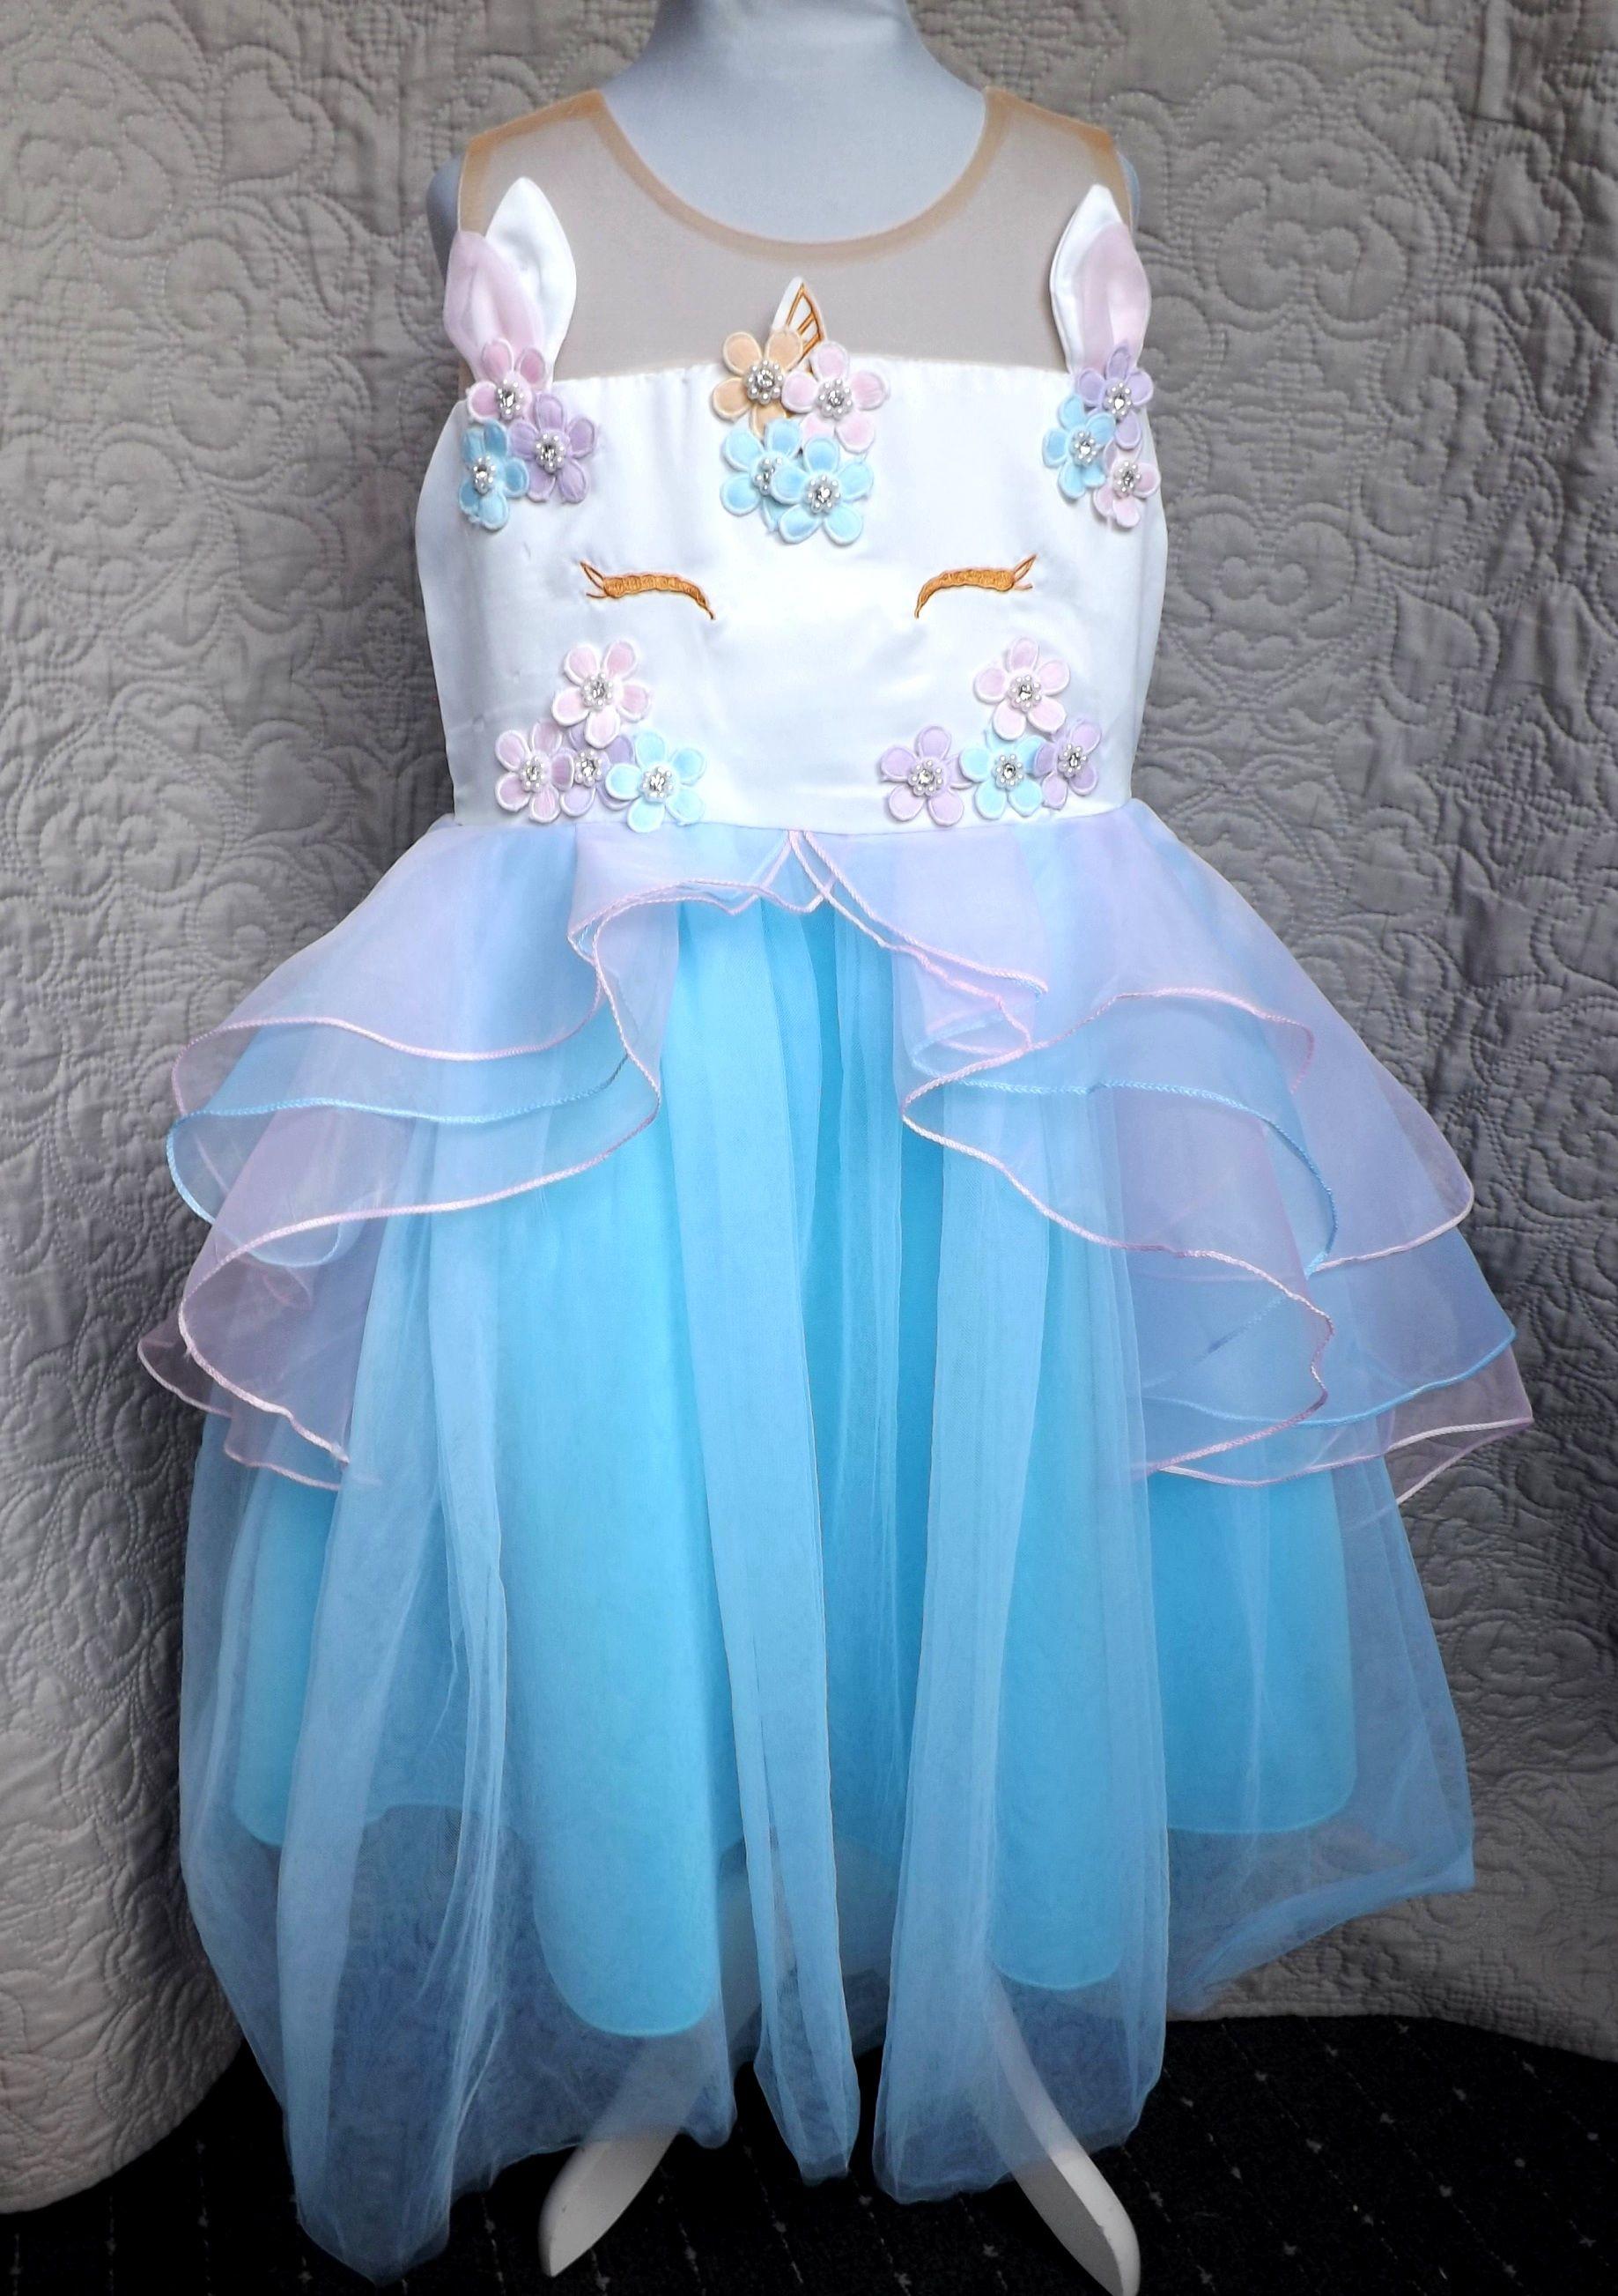 #PartyKleid #KinderKleid #GeburtstagsKleid # ...